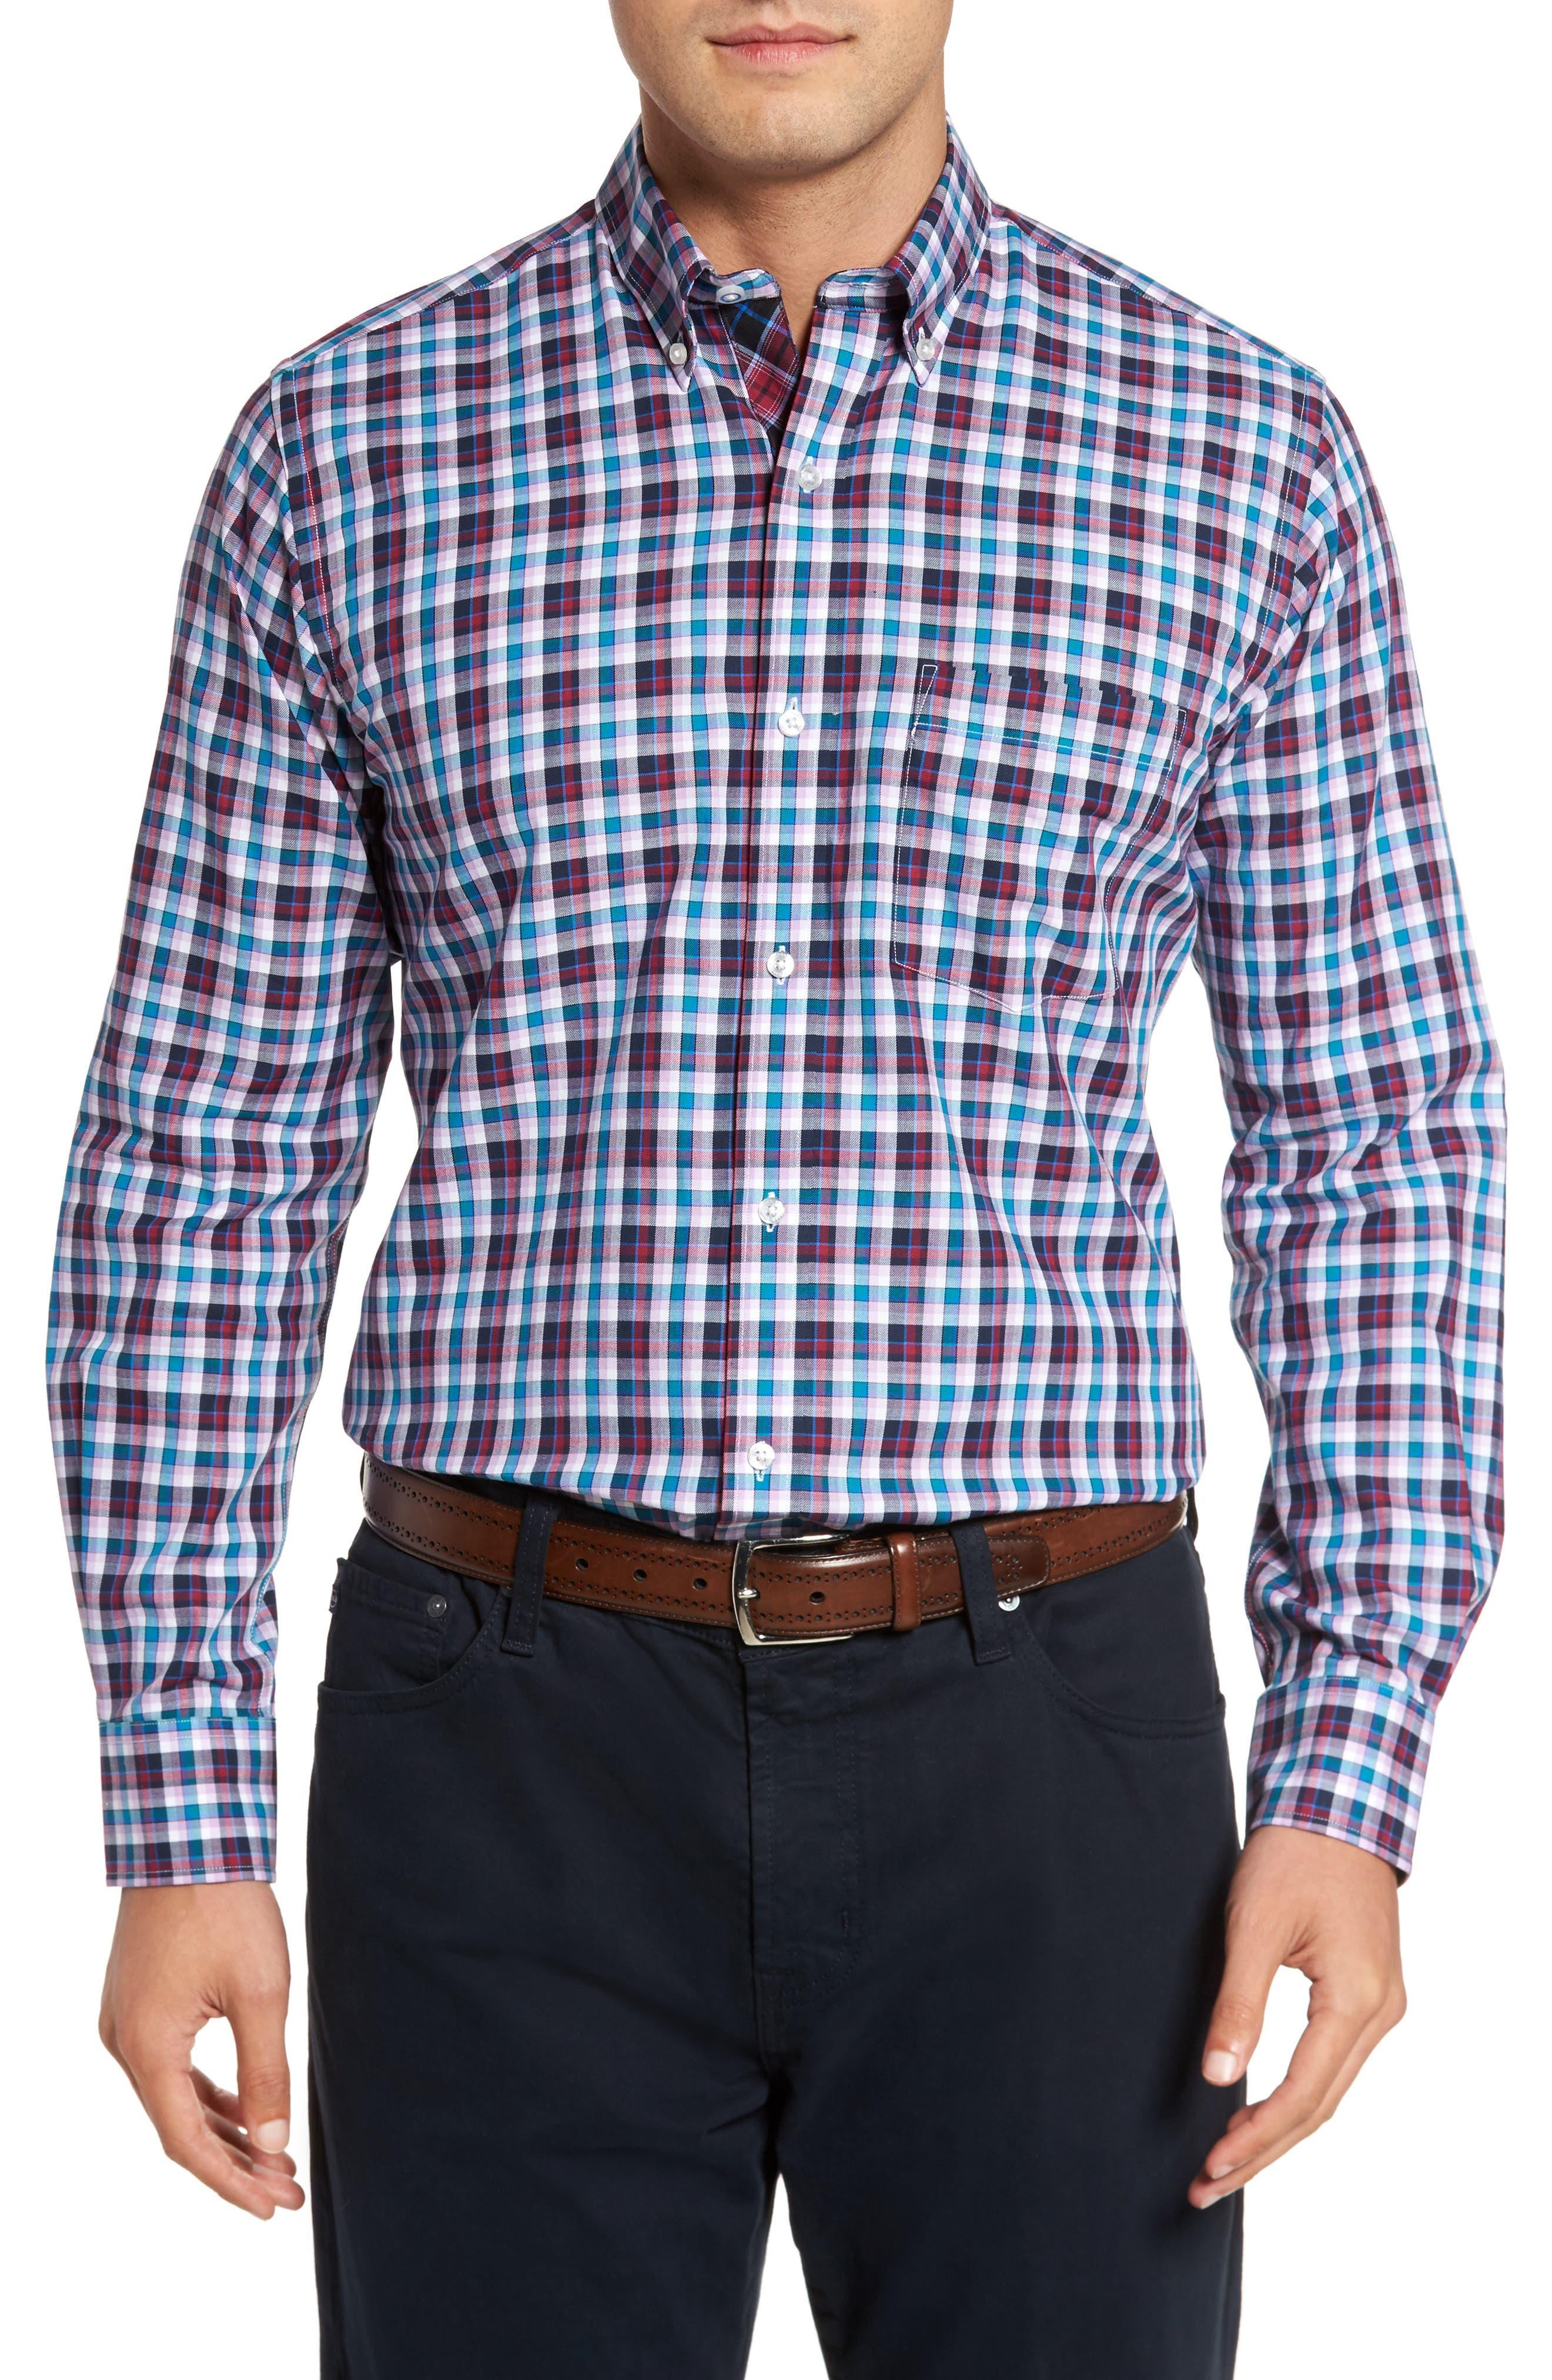 Main Image - TailorByrd Coushatta Plaid Sport Shirt